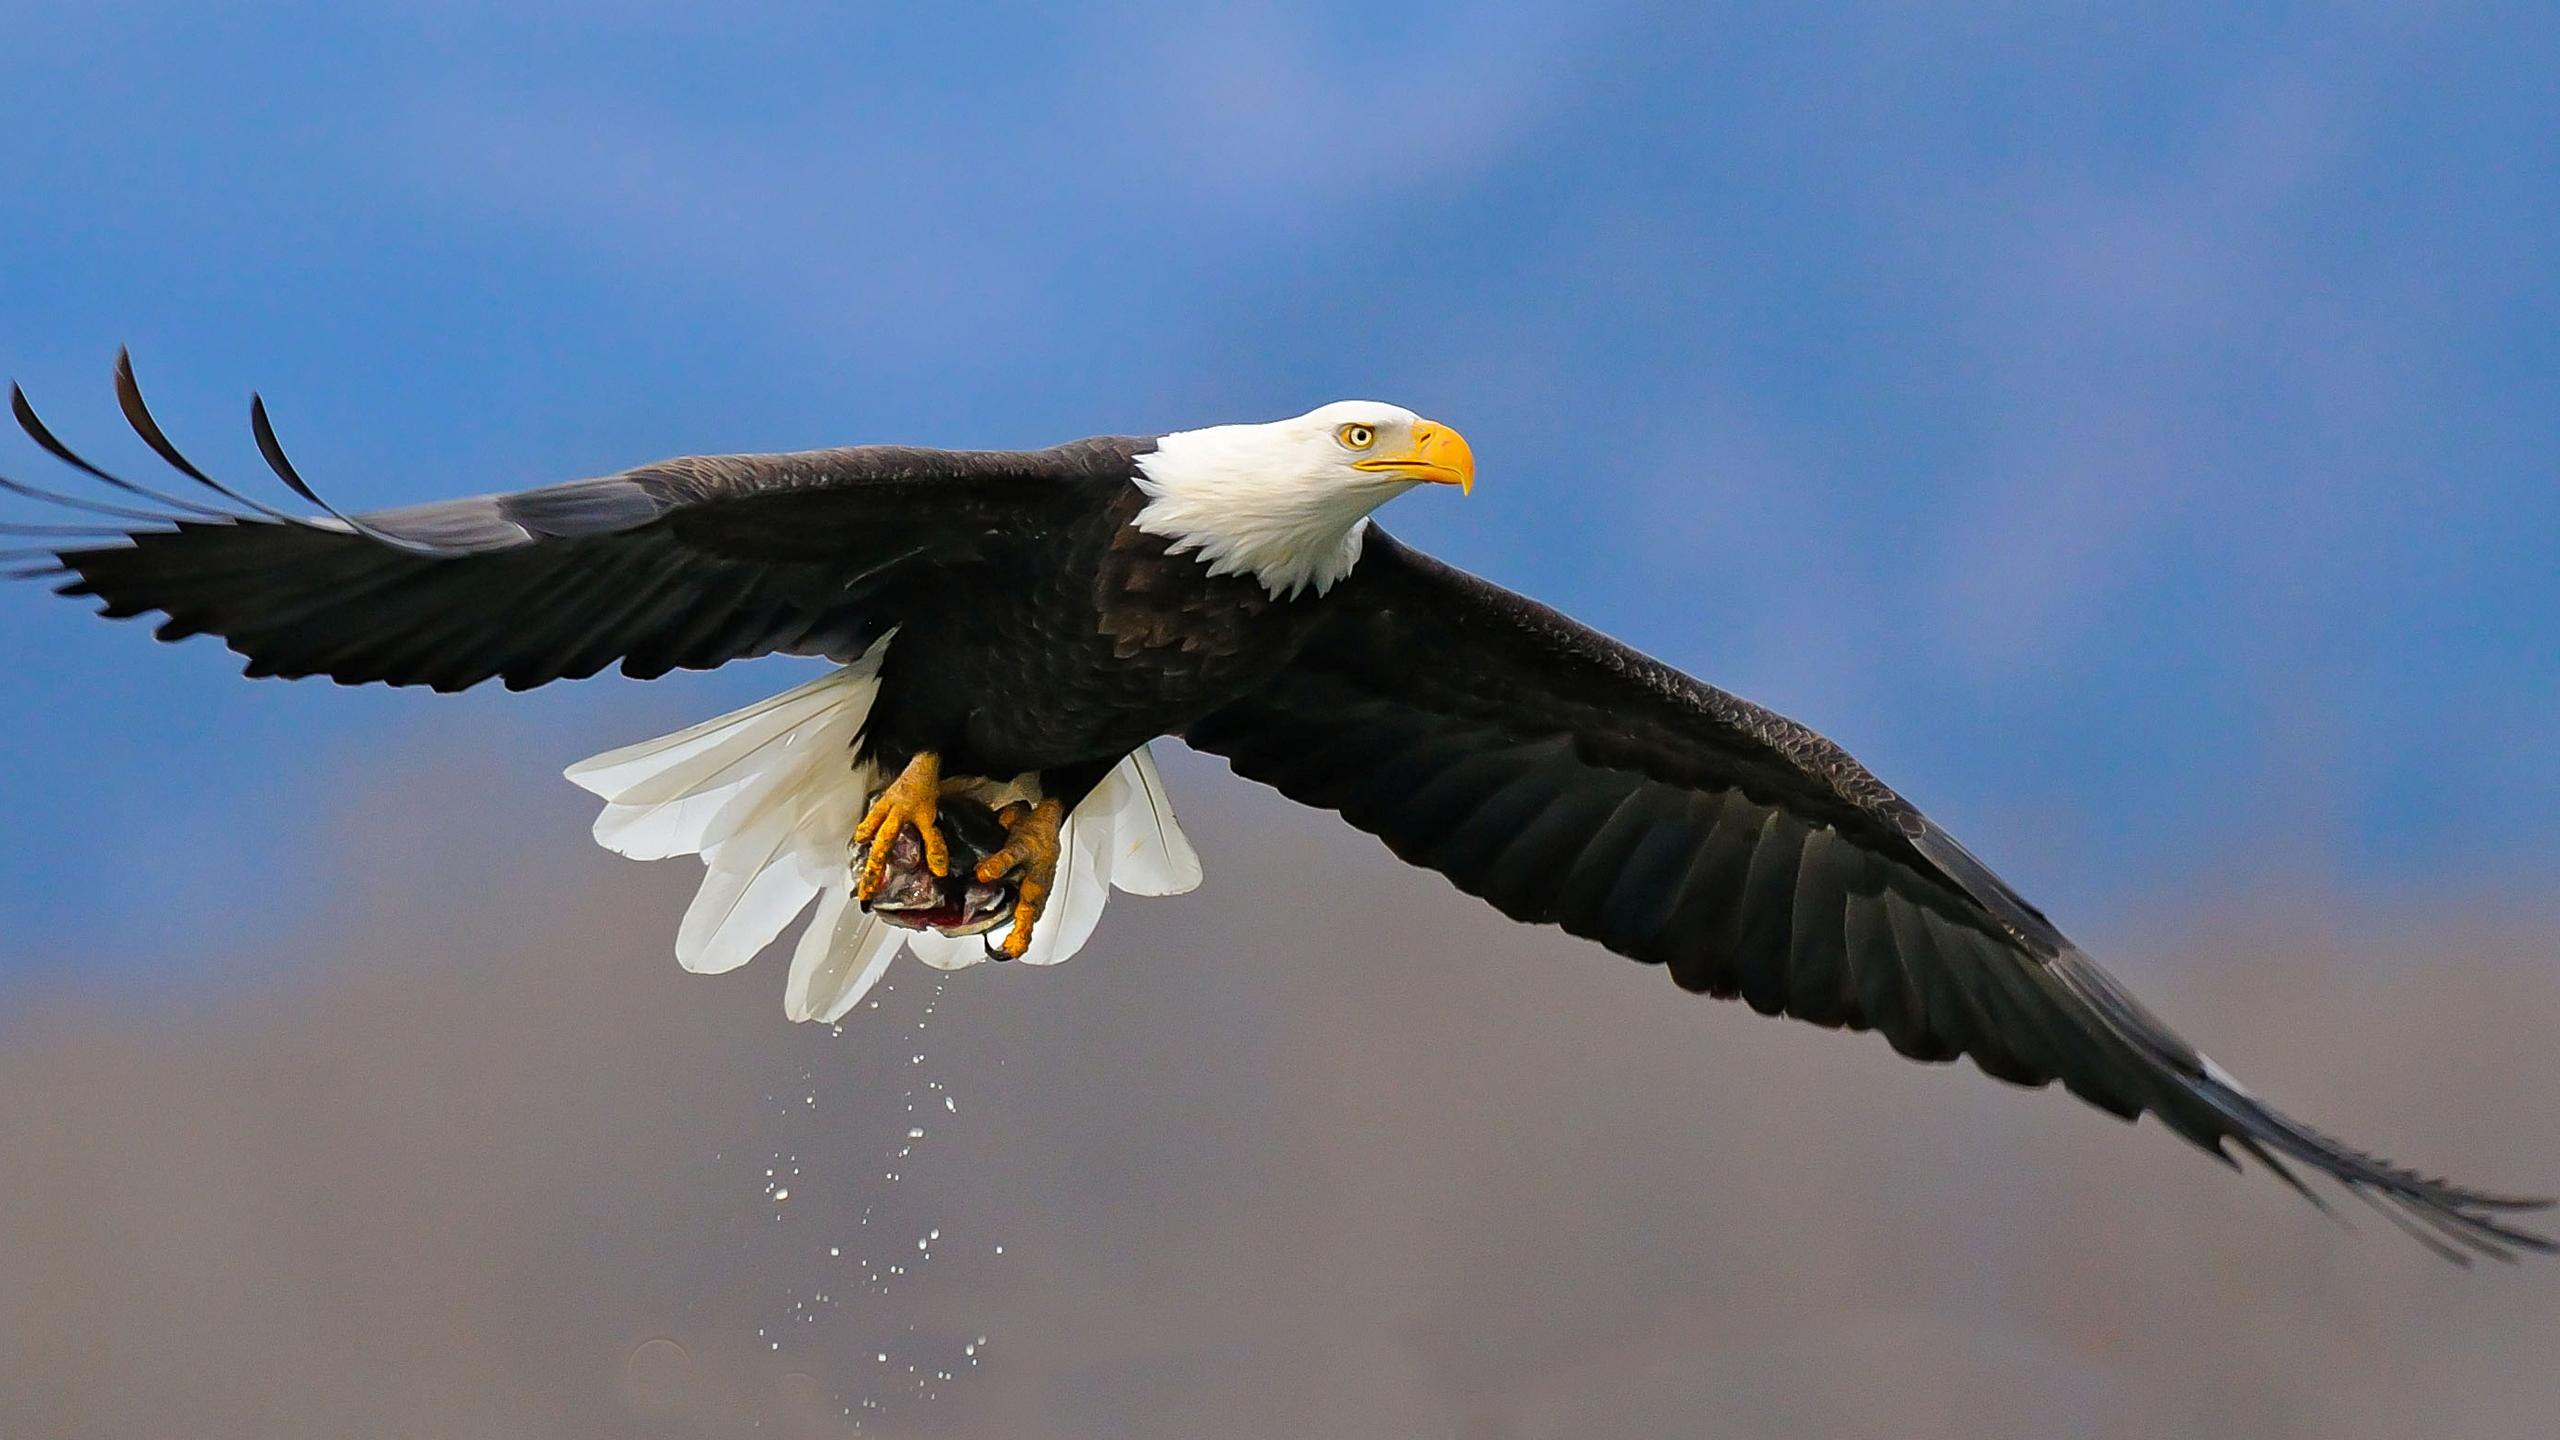 eagle backgrounds